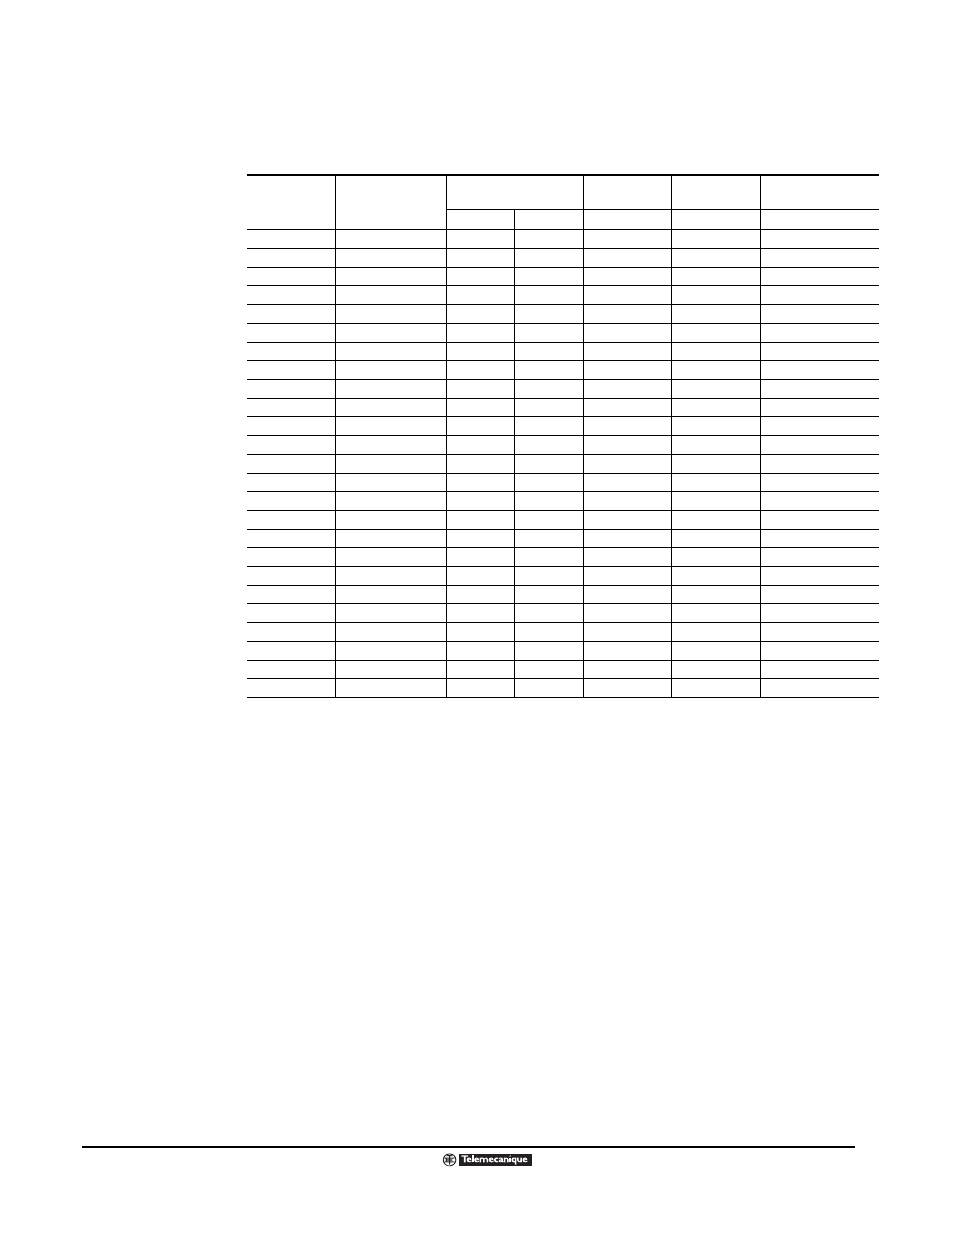 Altivar, 58 trx ac drives, Type h drive controllers